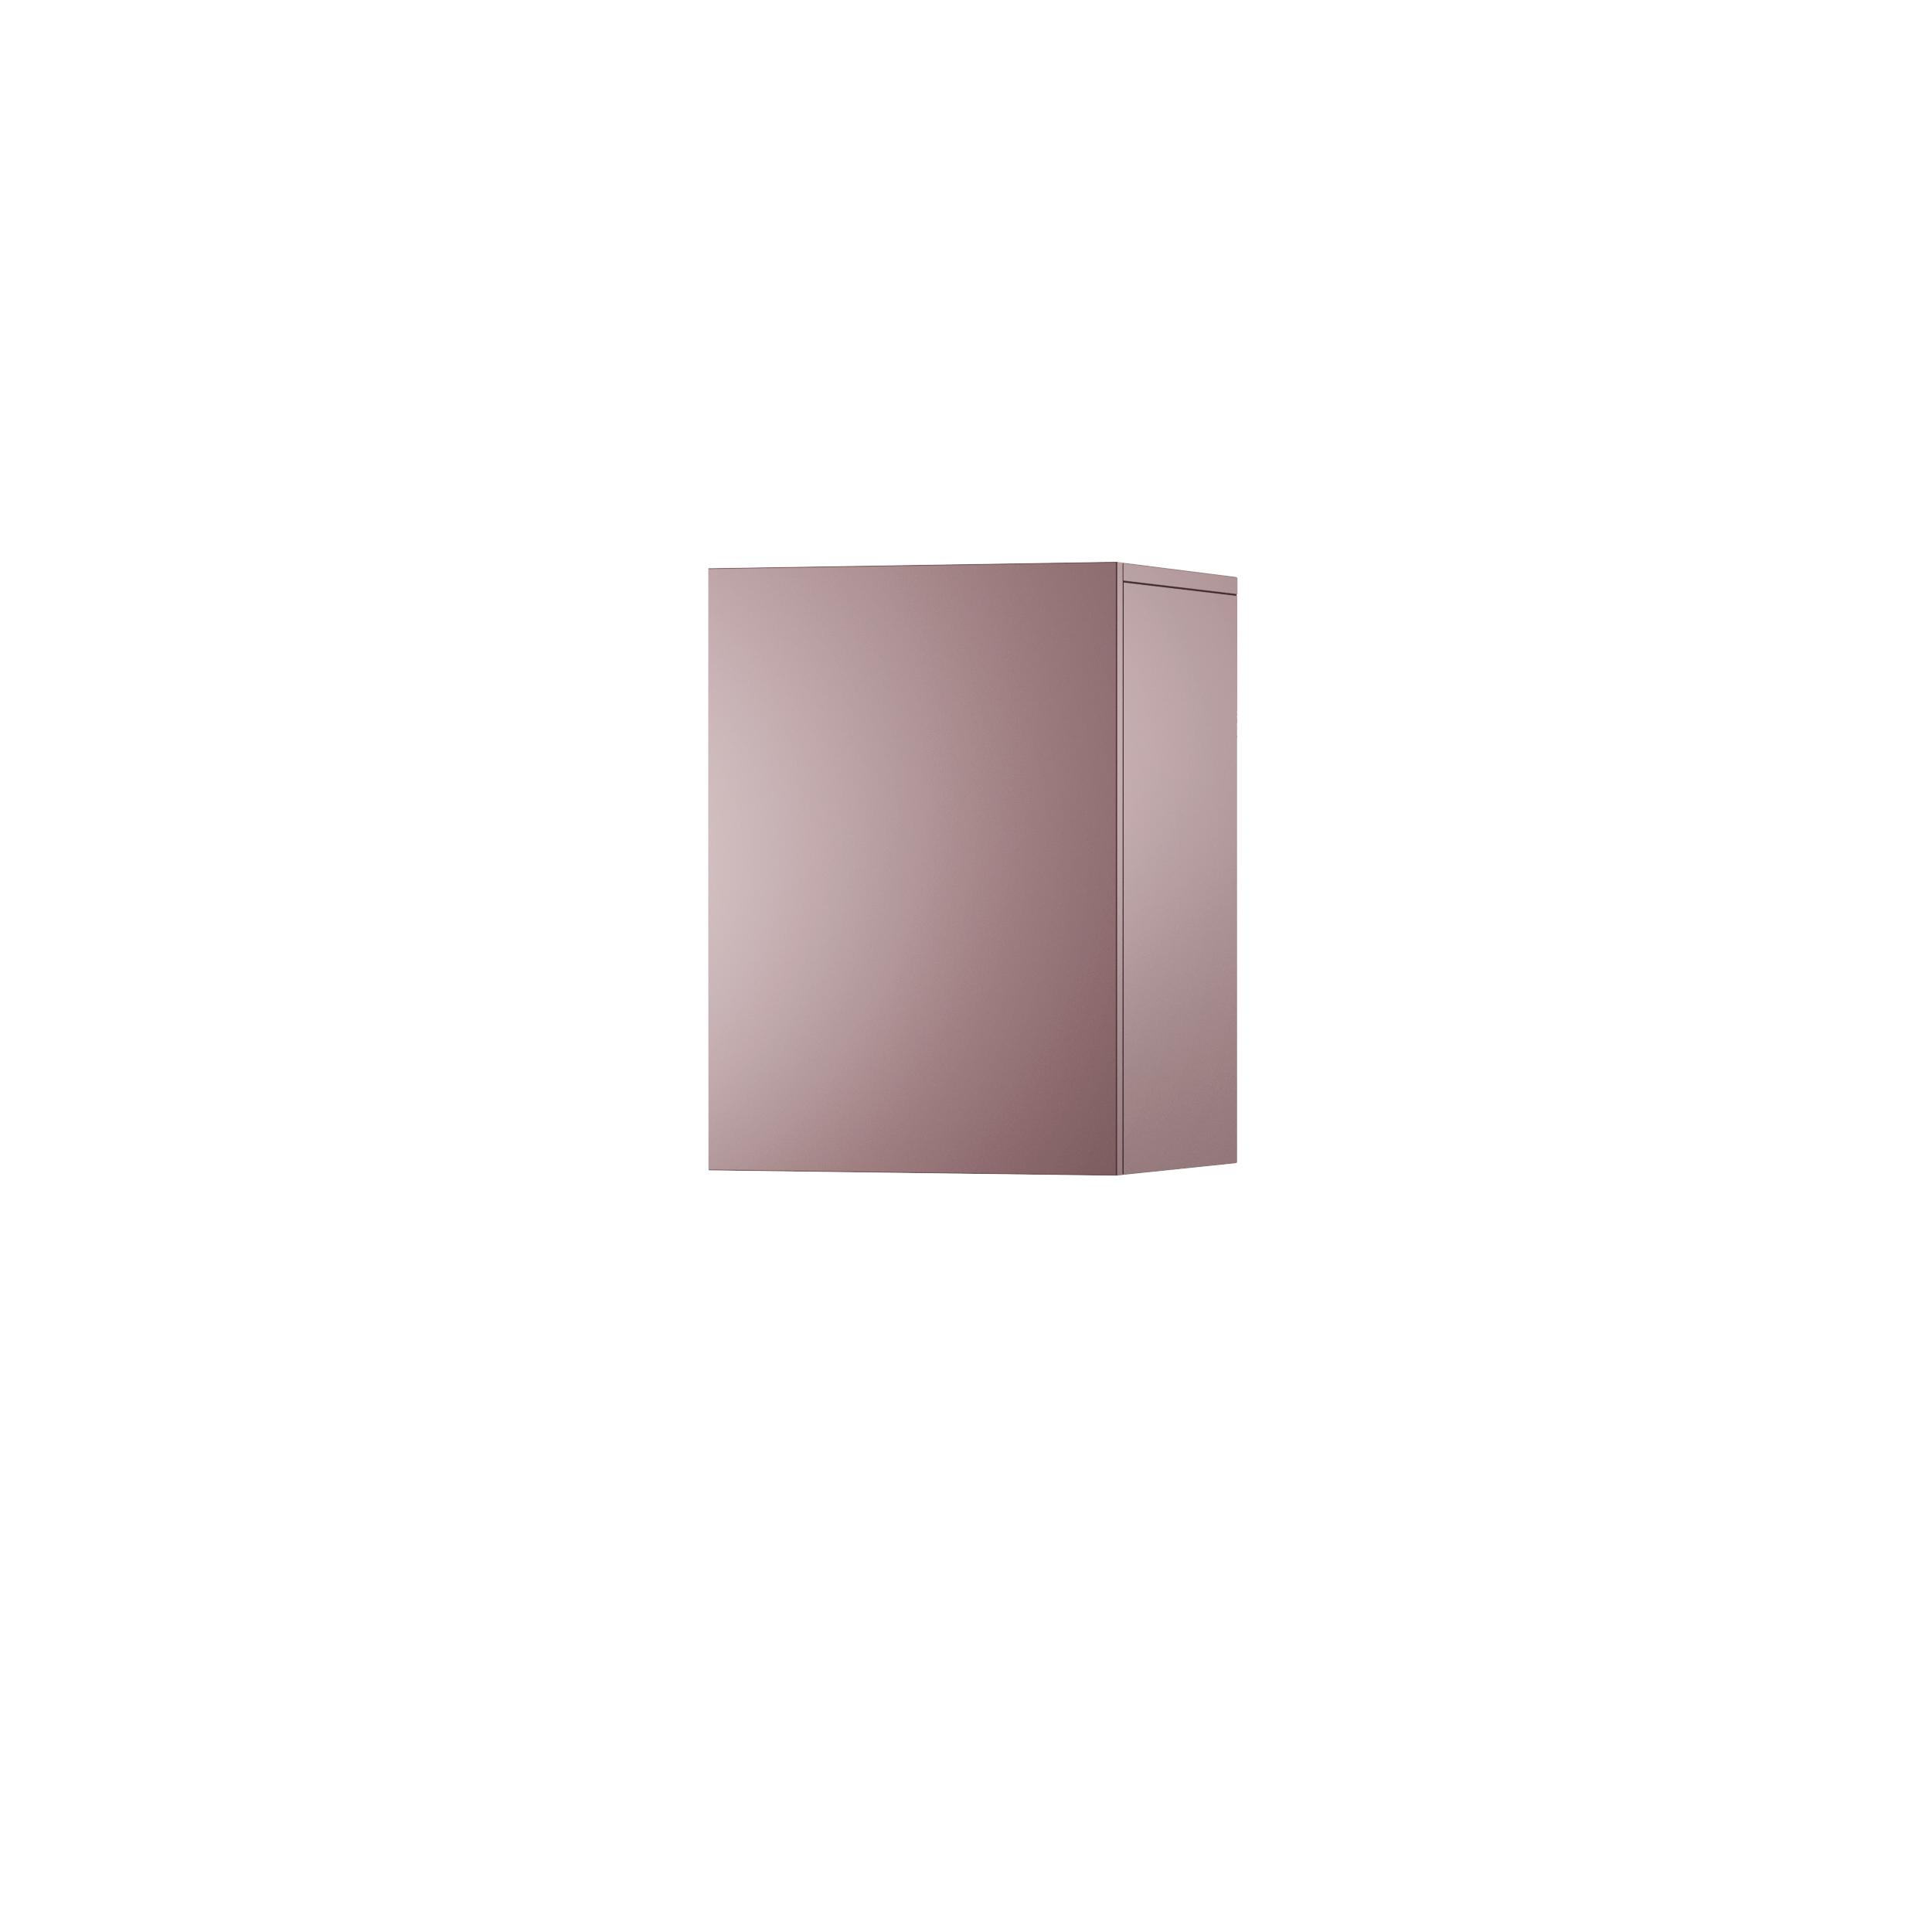 Dulap Modular Violet - 10287